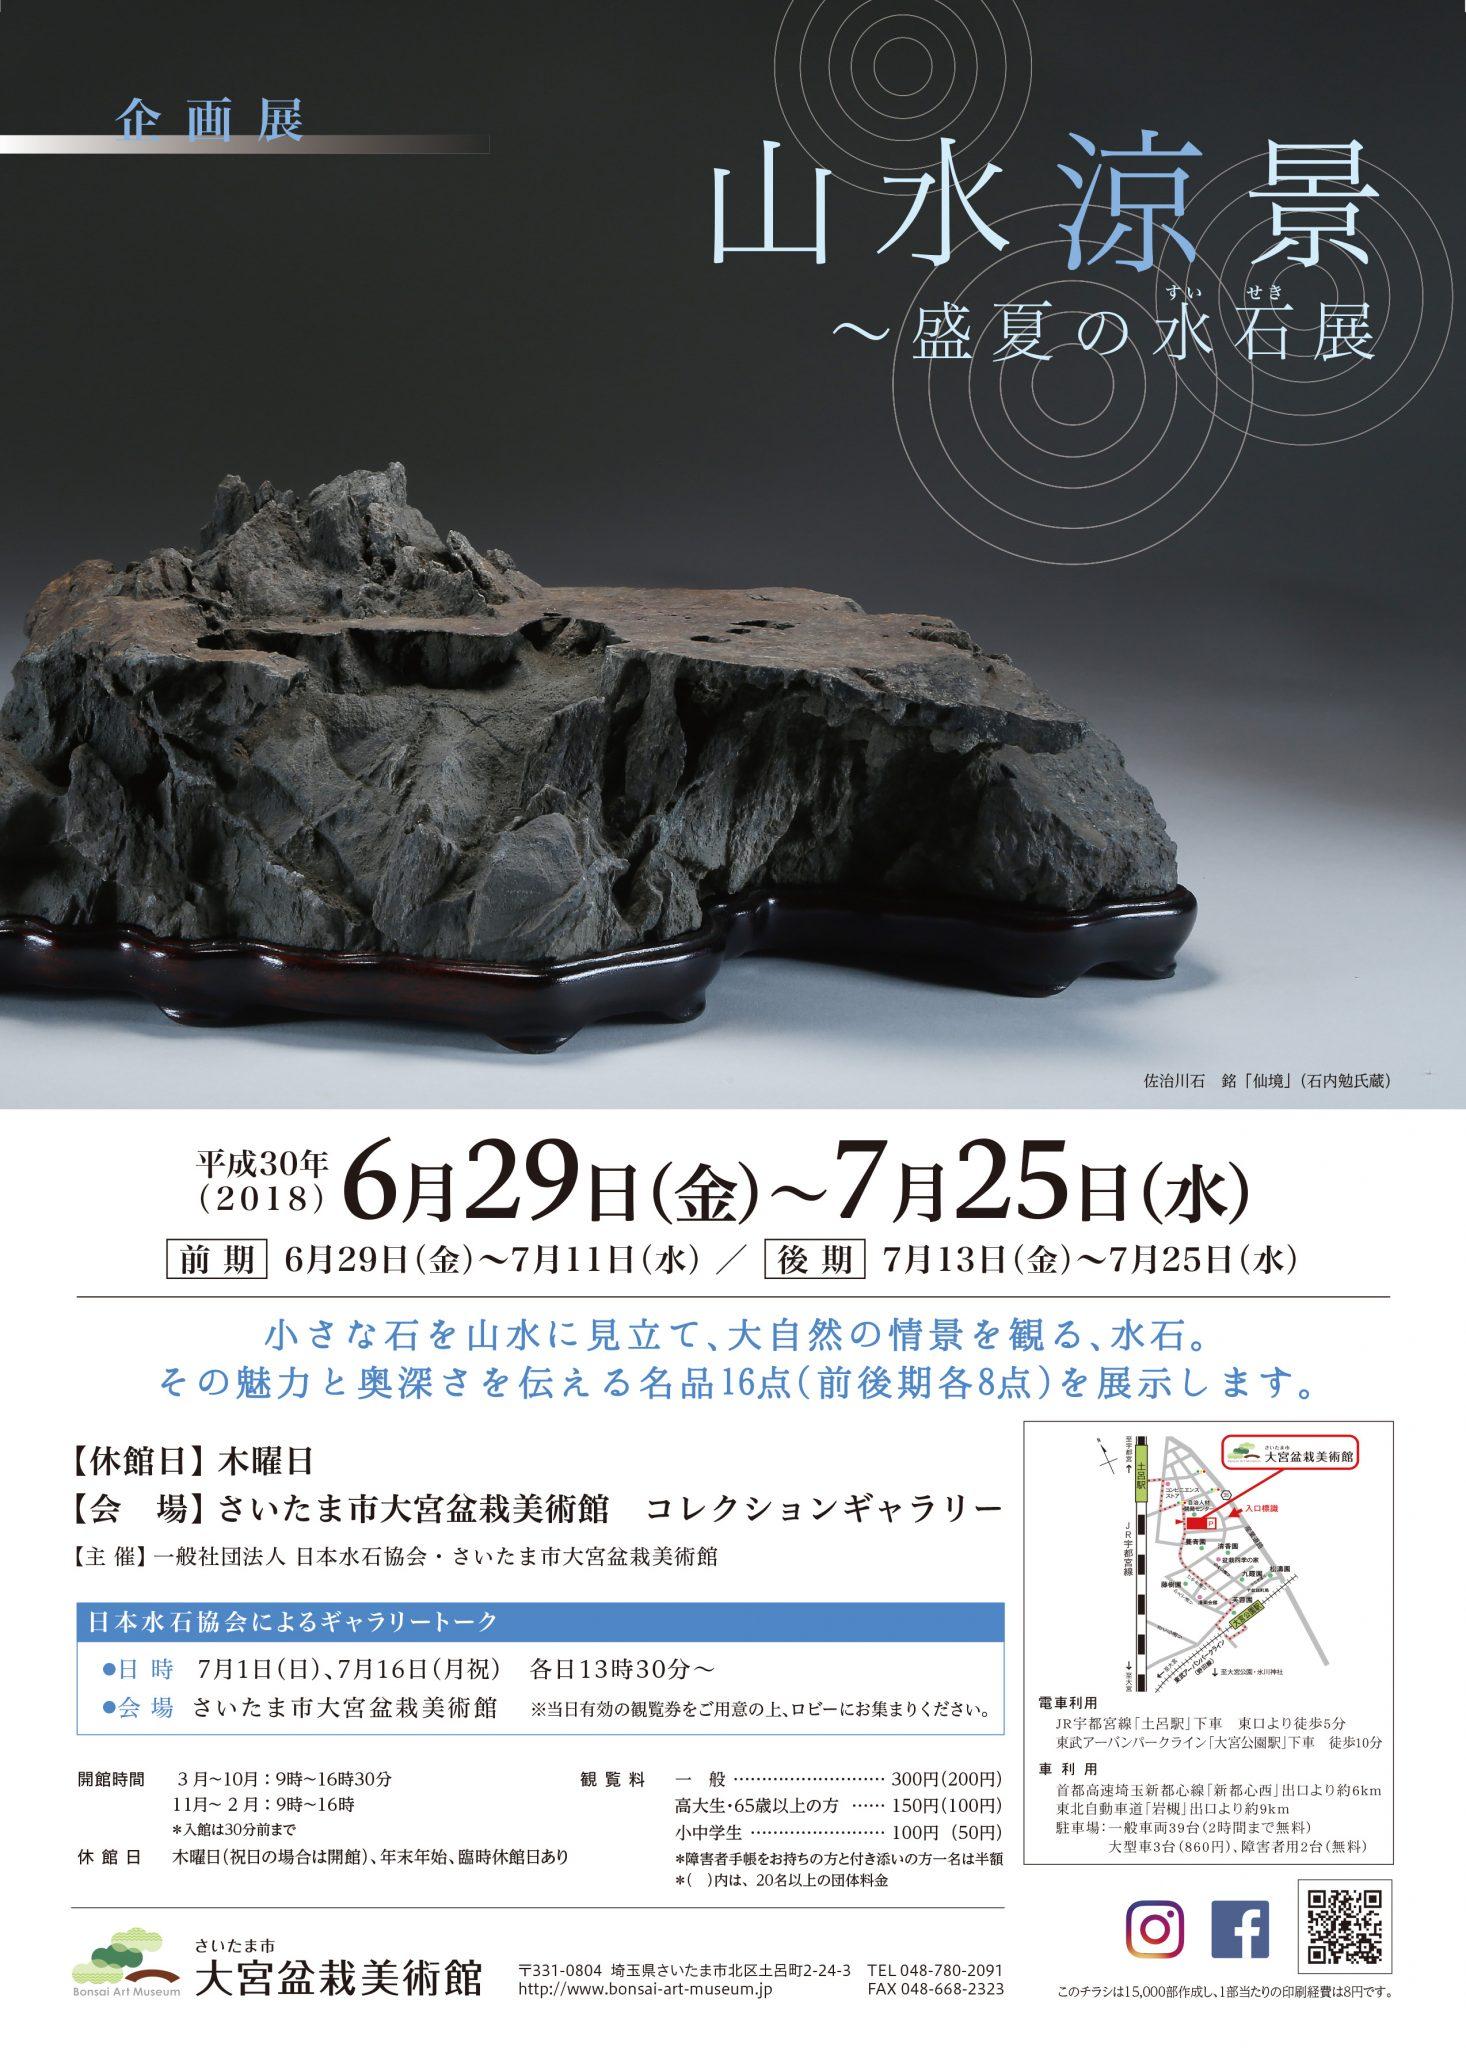 Suiseki-Miniature Landscape Stone